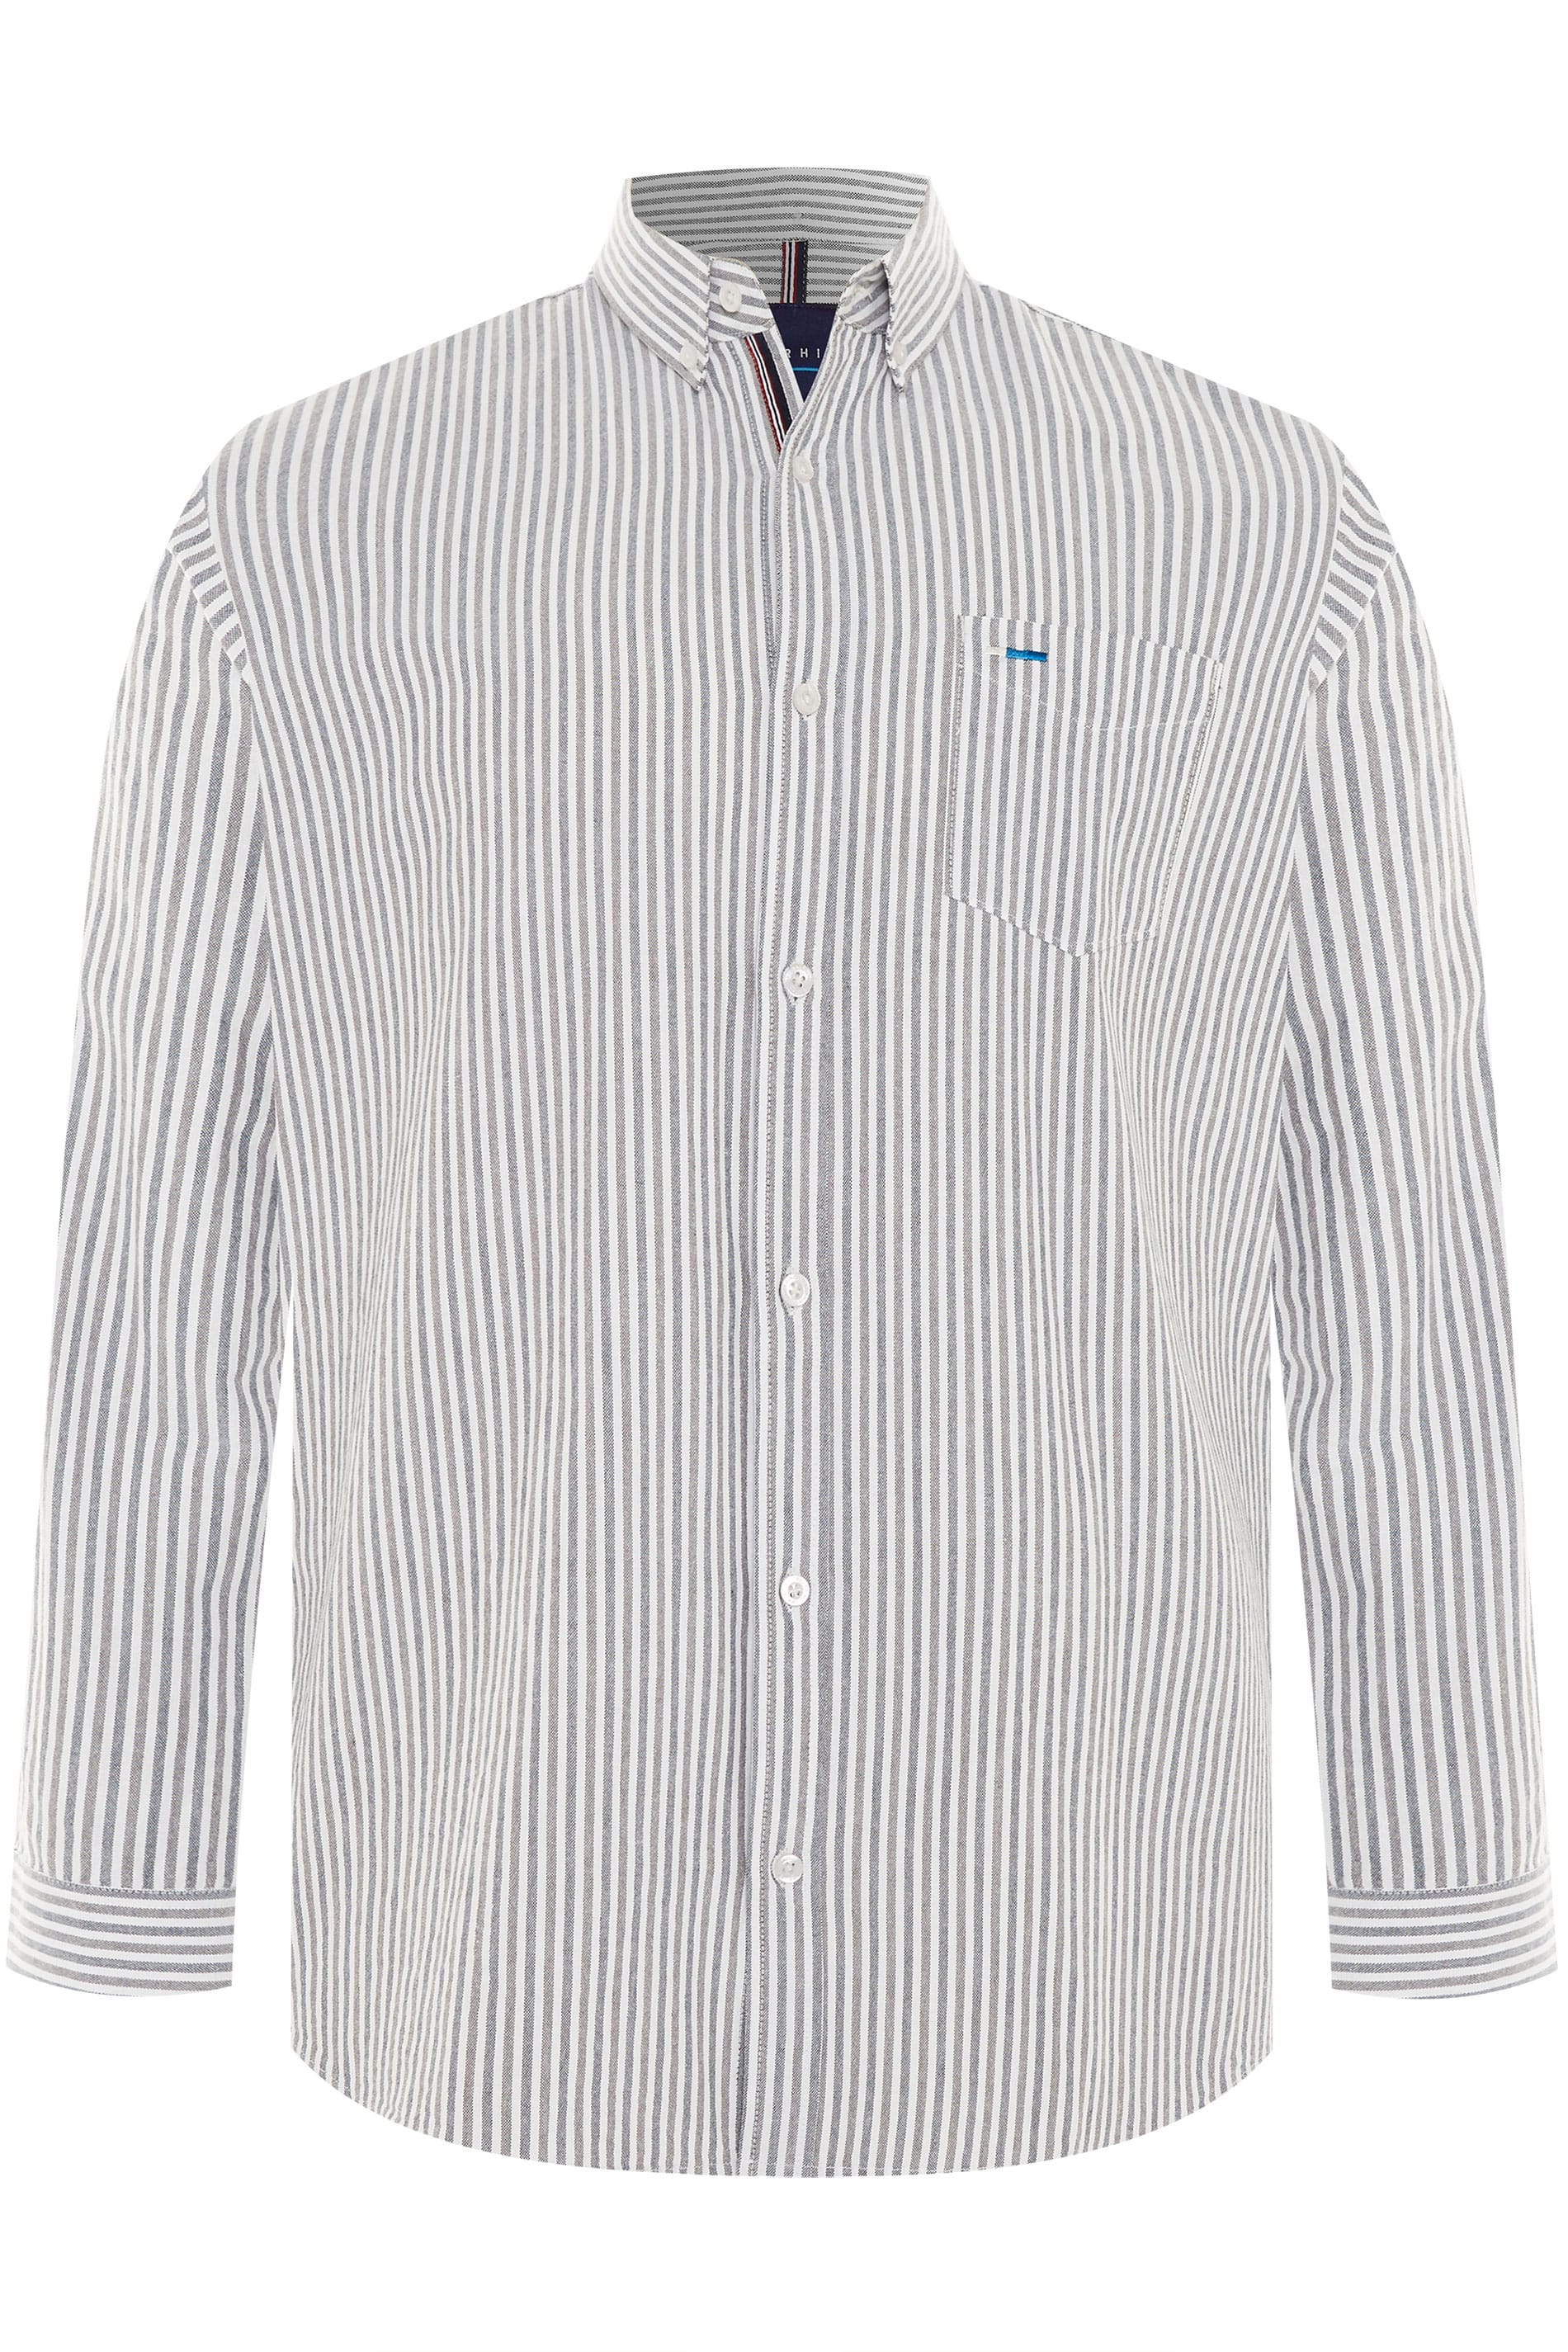 BadRhino Blue & Grey Striped Long Sleeved Oxford Shirt